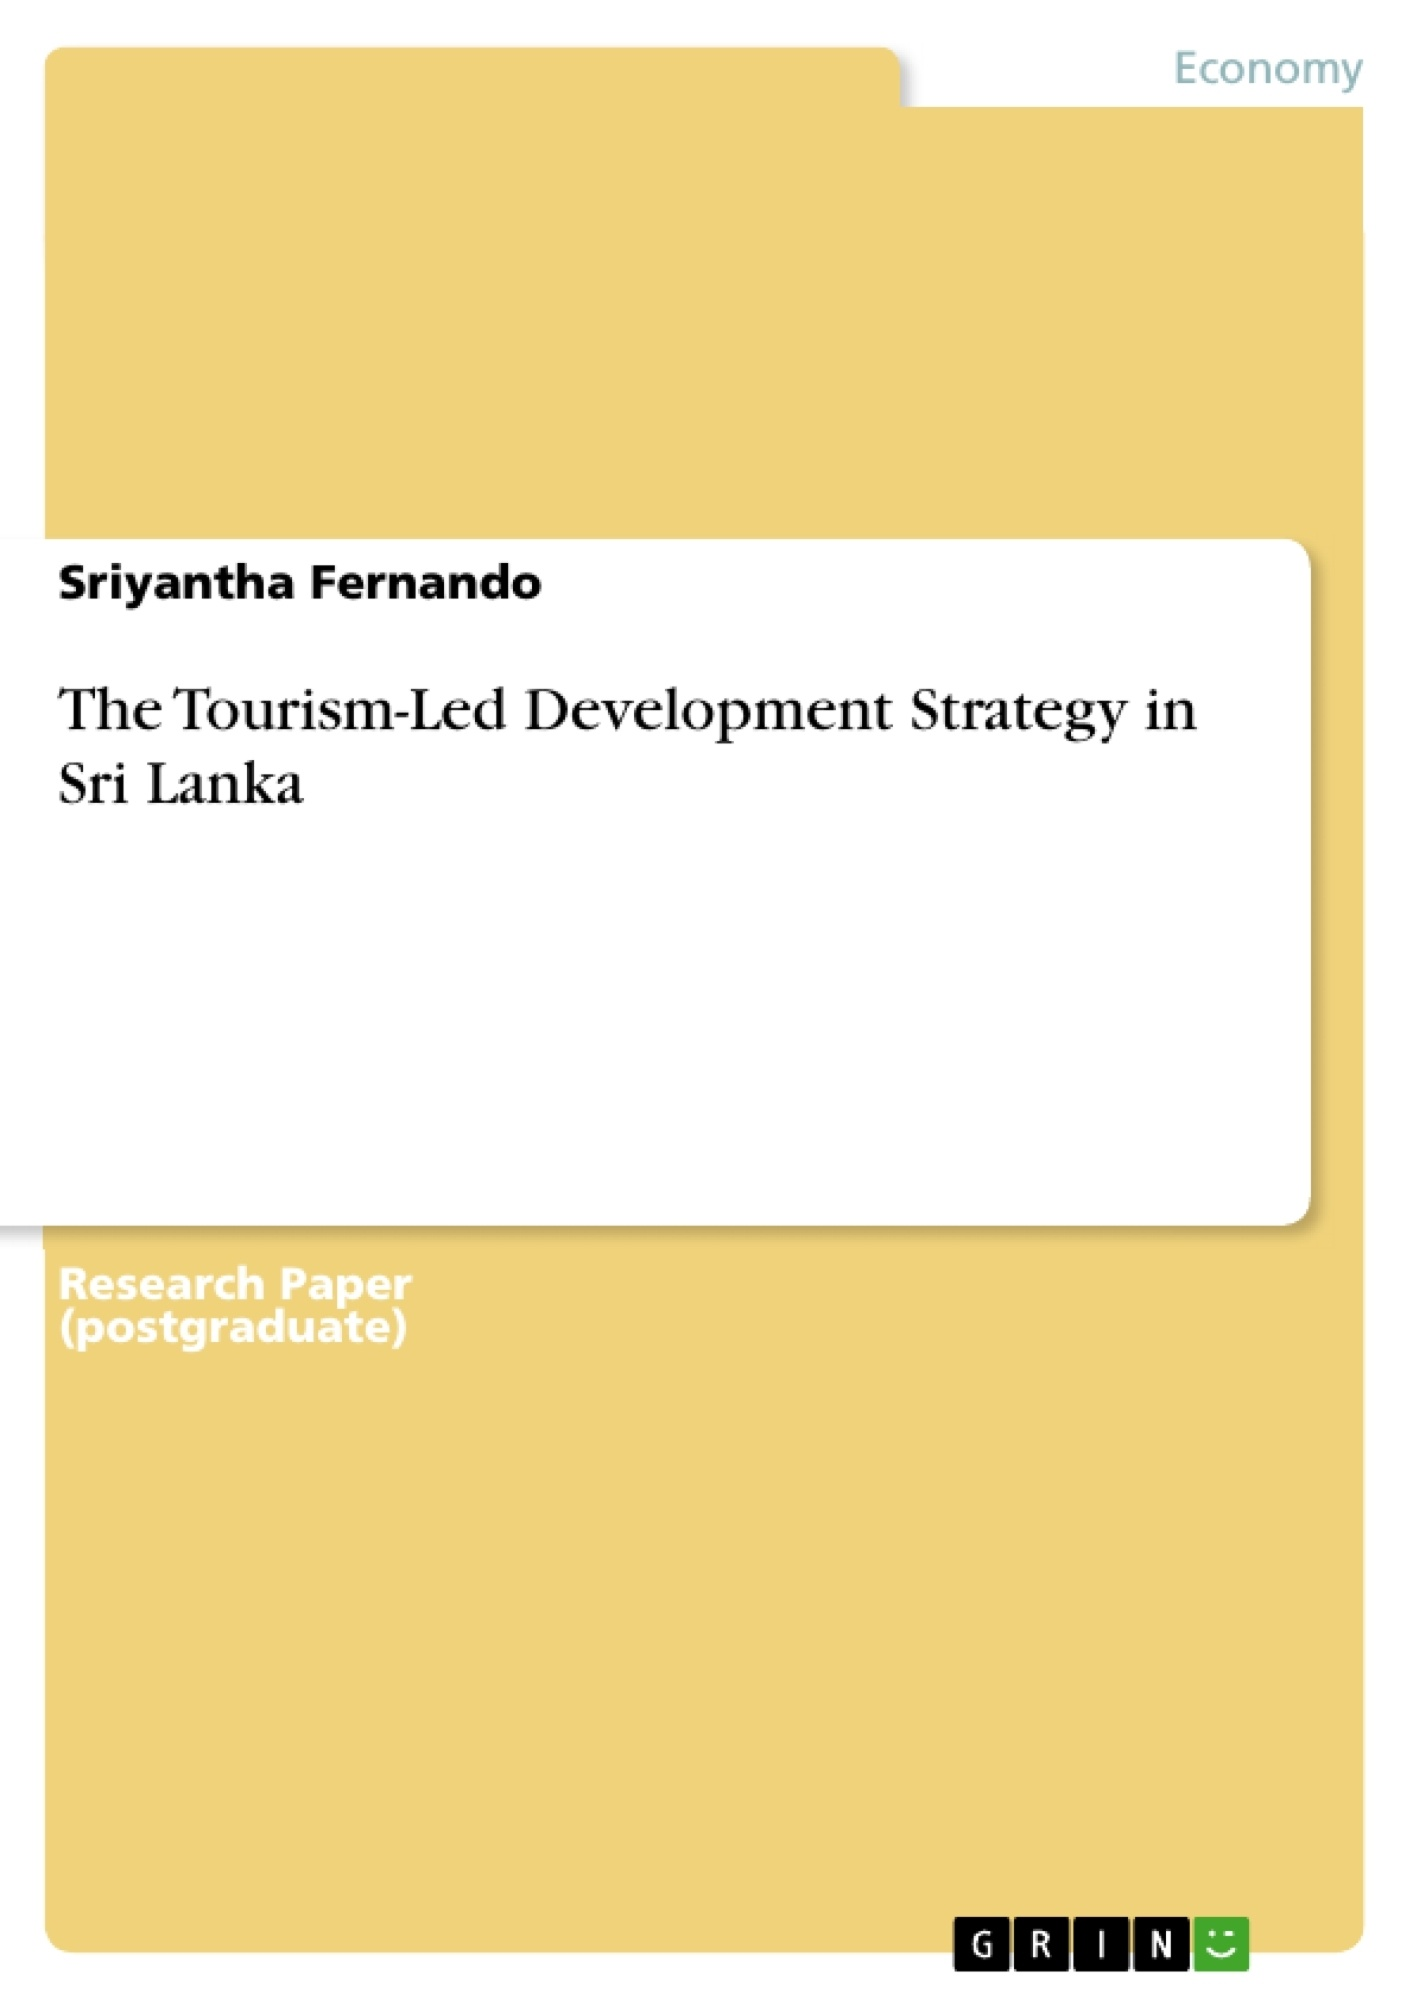 Title: The Tourism-Led Development Strategy in Sri Lanka